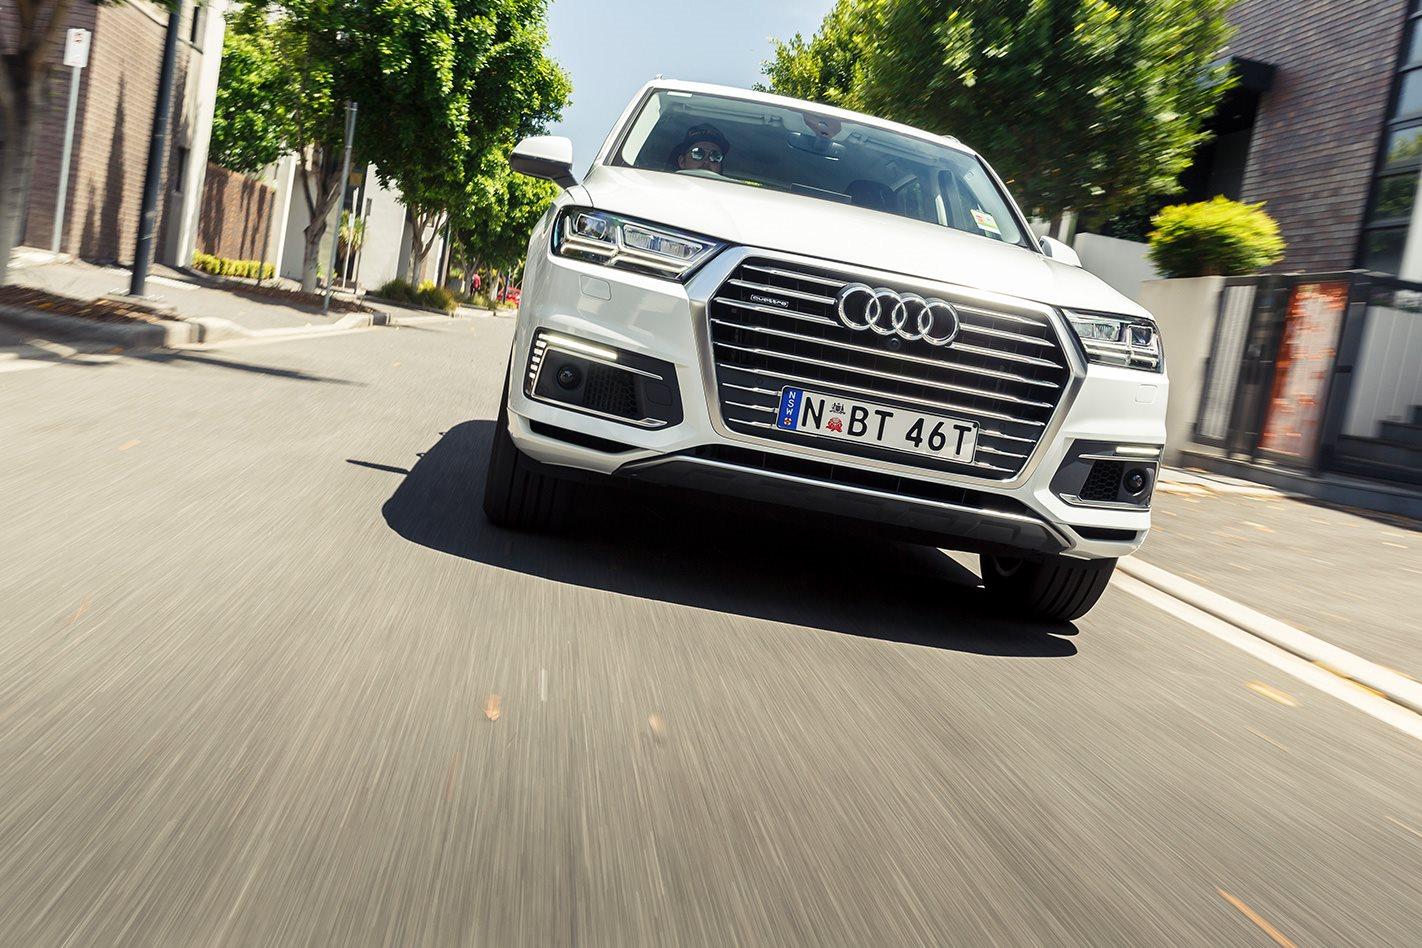 Kelebihan Audi Q7 Etron Harga